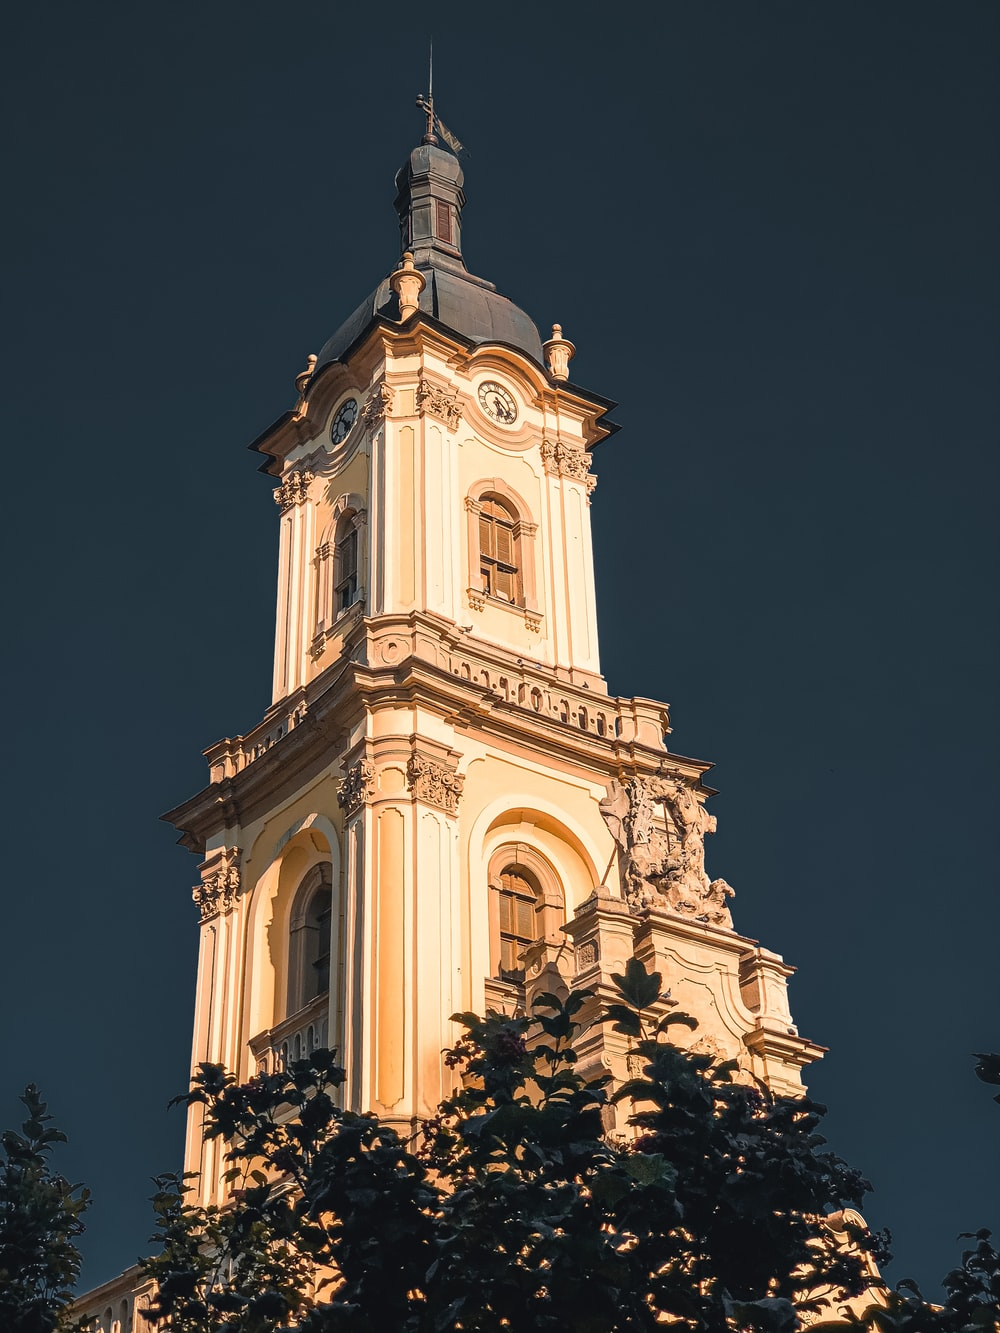 white concrete church under blue sky during daytime